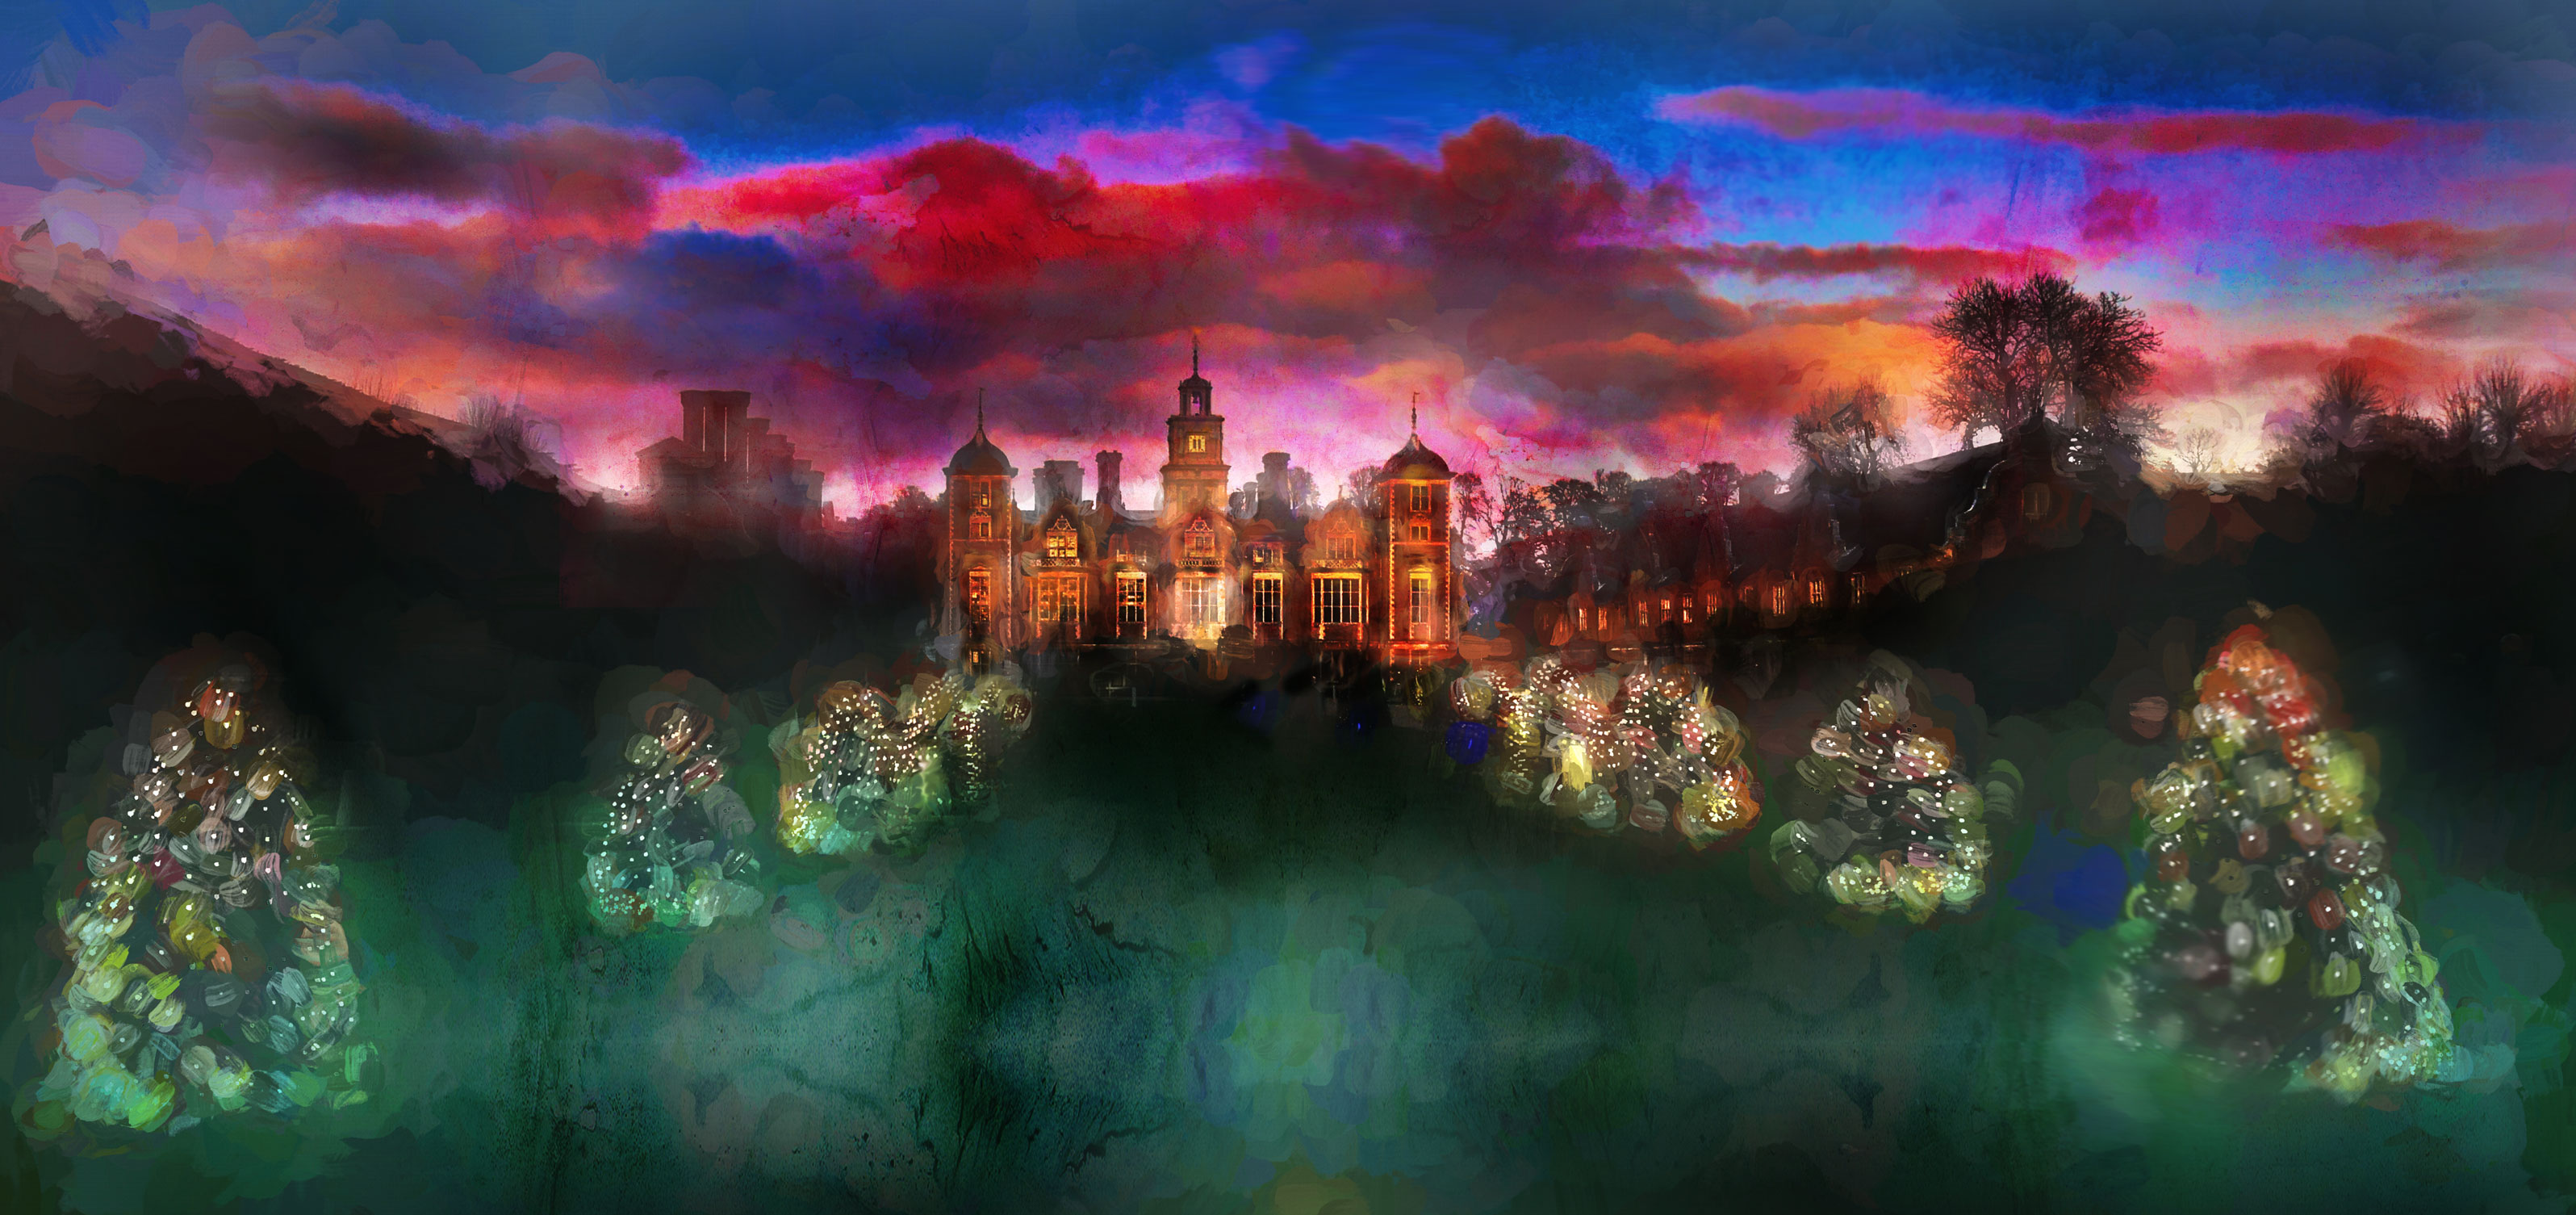 Walk Along in Twilight's Vibrance